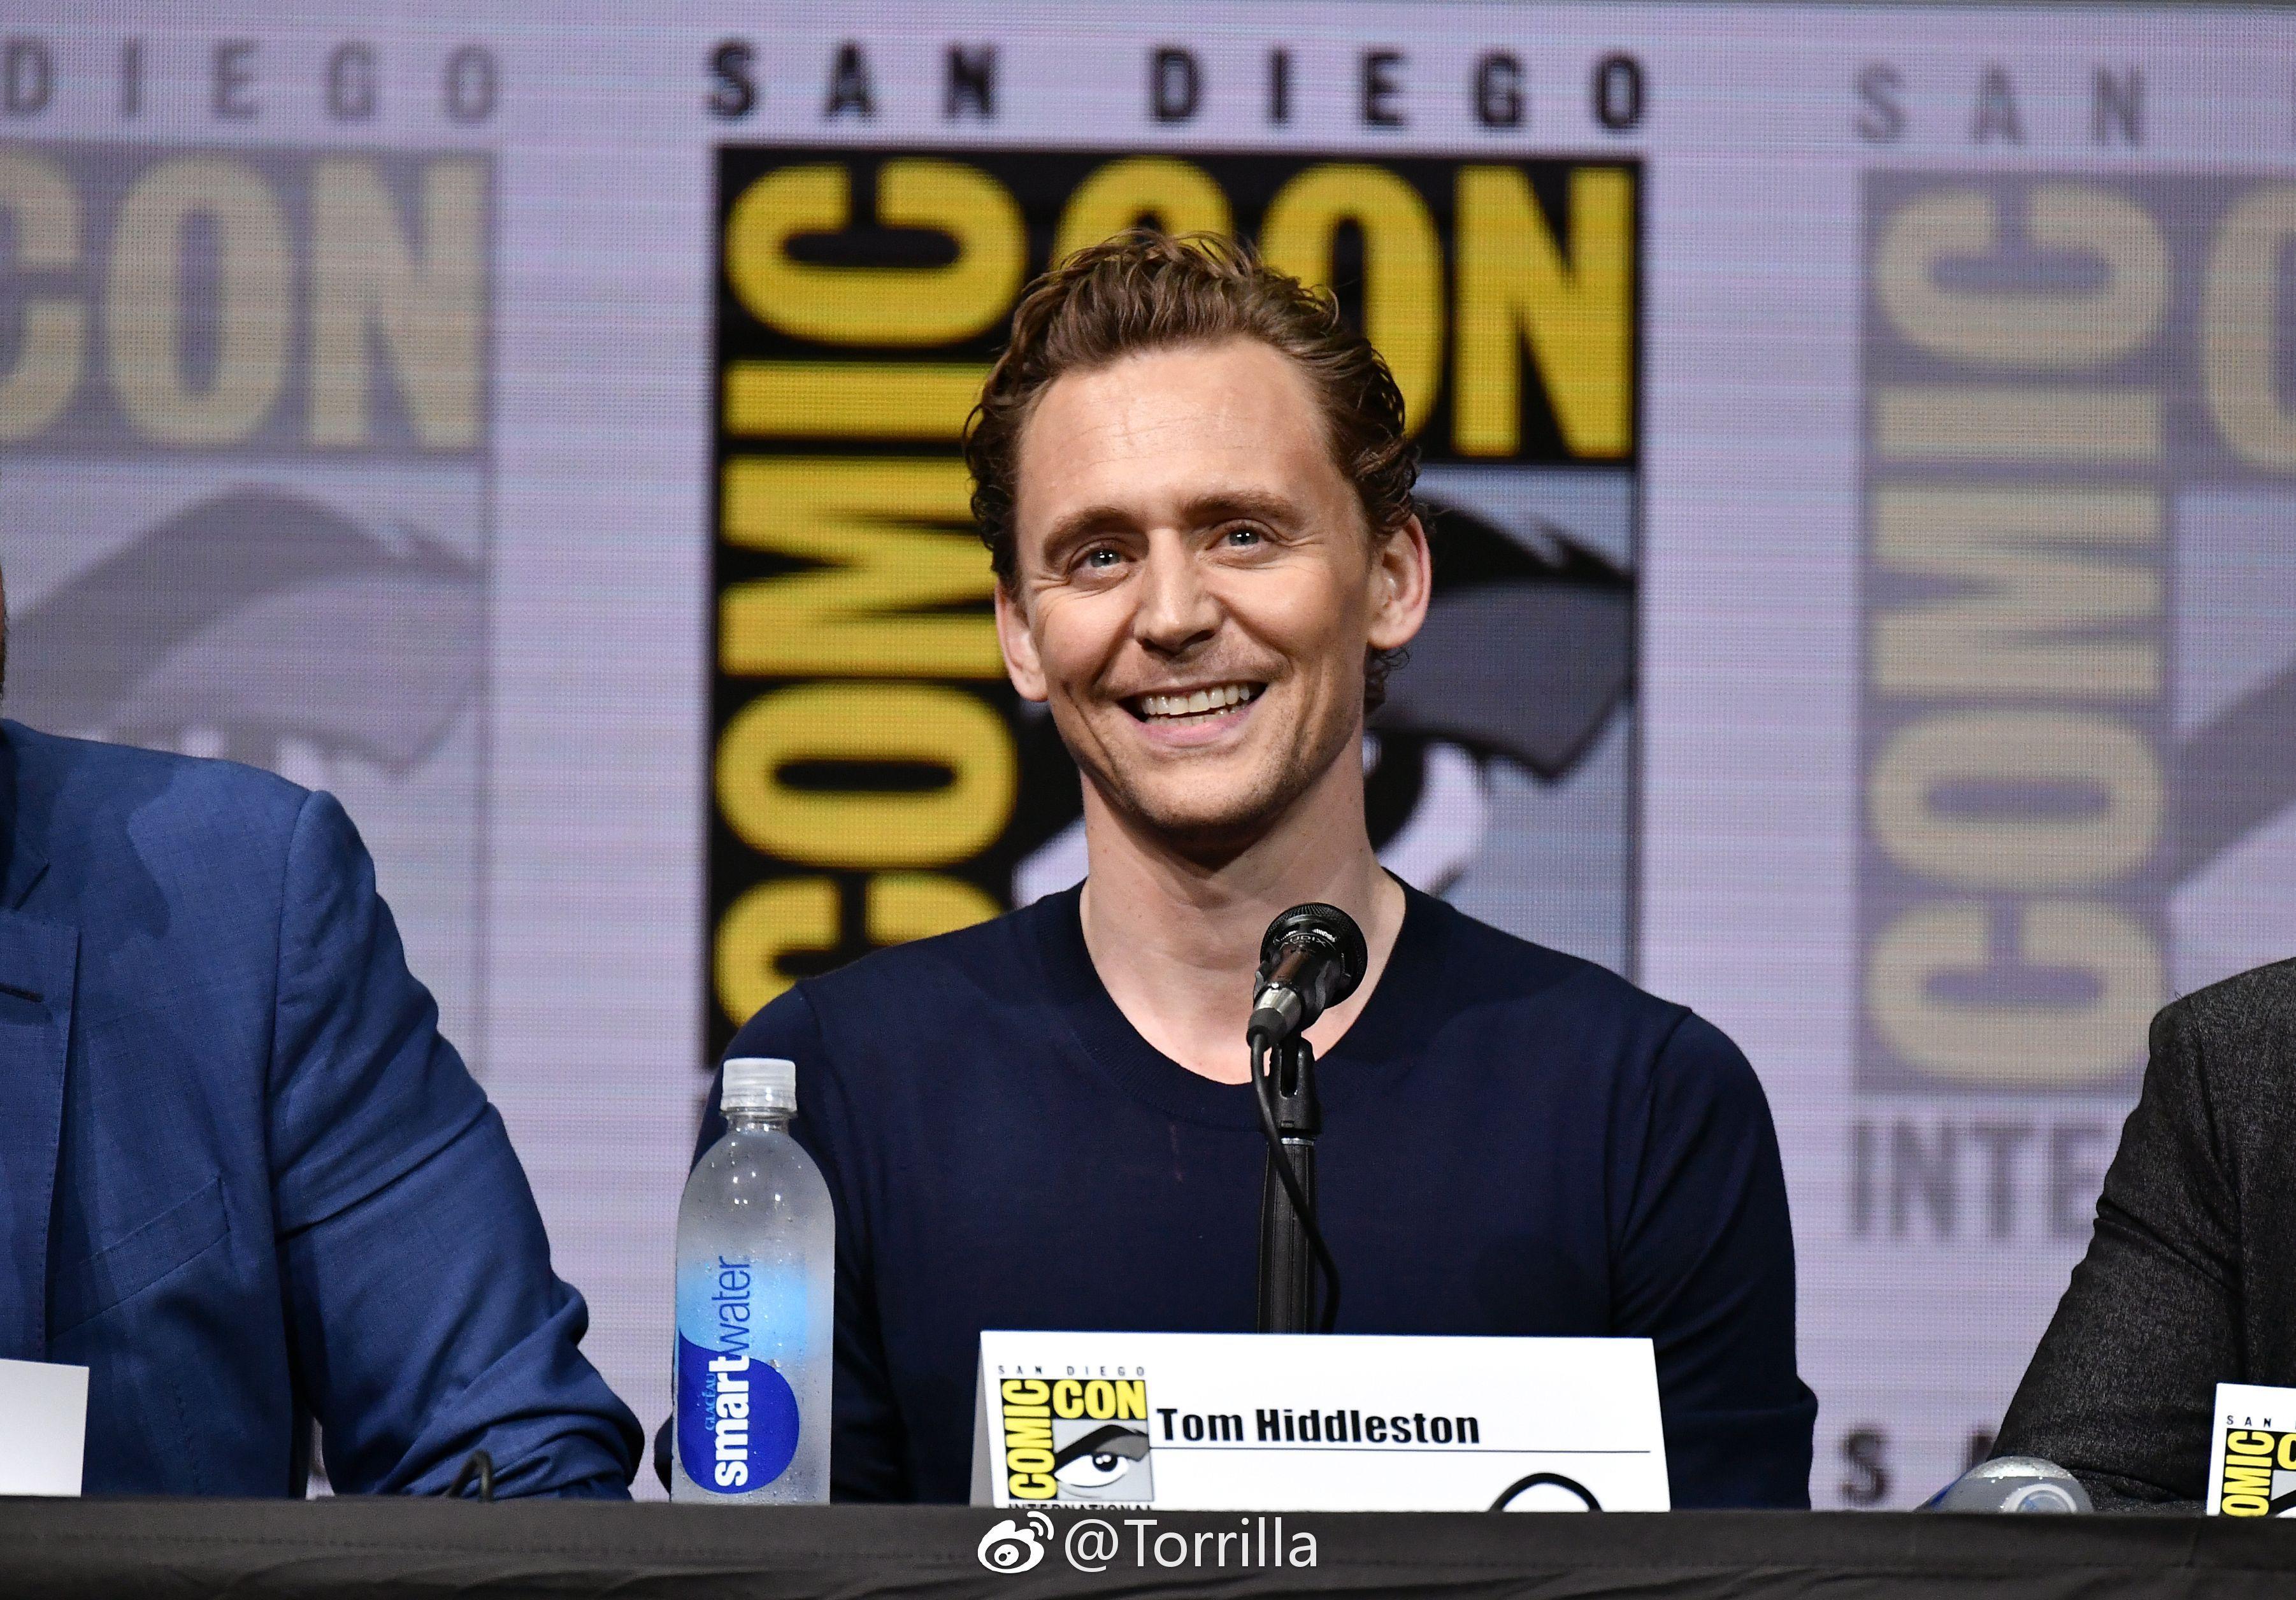 Tom Hiddleston. #SDCC2017